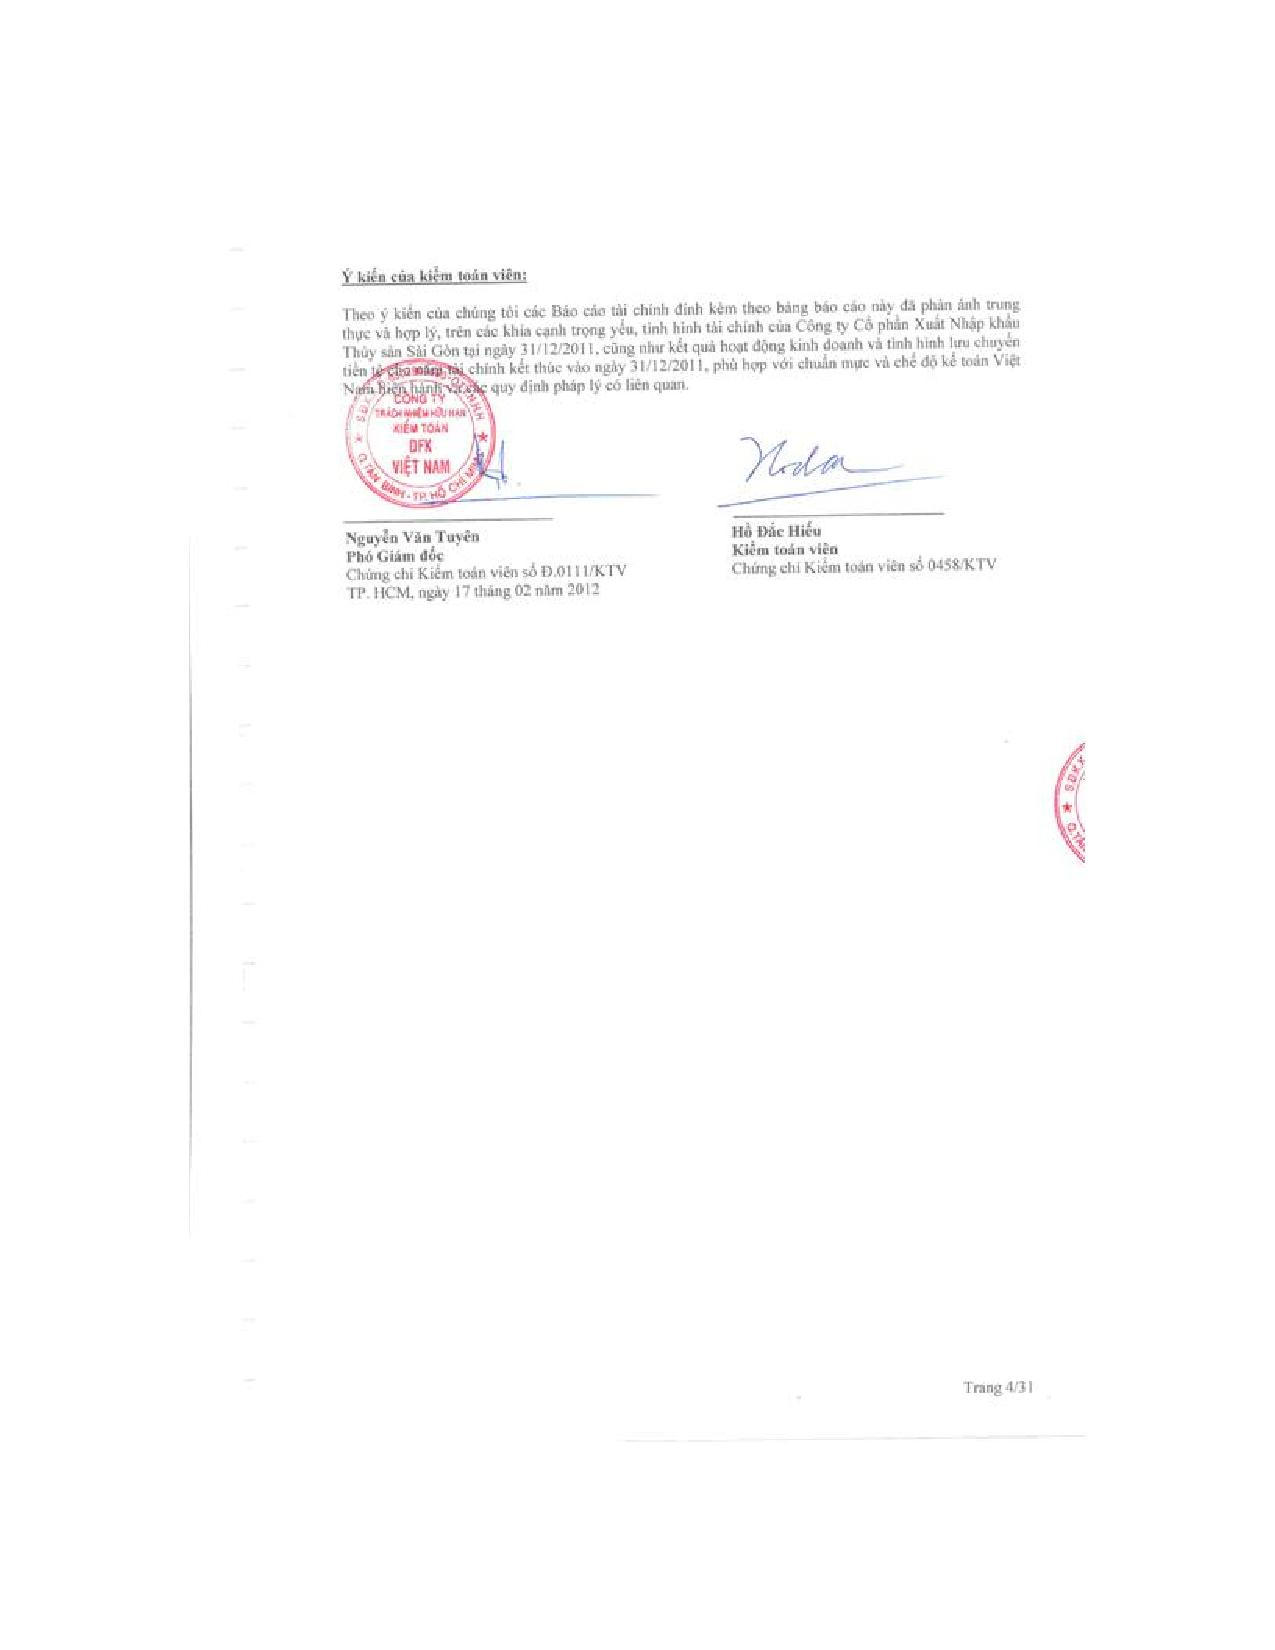 2342012234_Bao-Cao-Tai-Chanh-2011-Seaprodex-Saigon-Da-kiem-toan-page-006